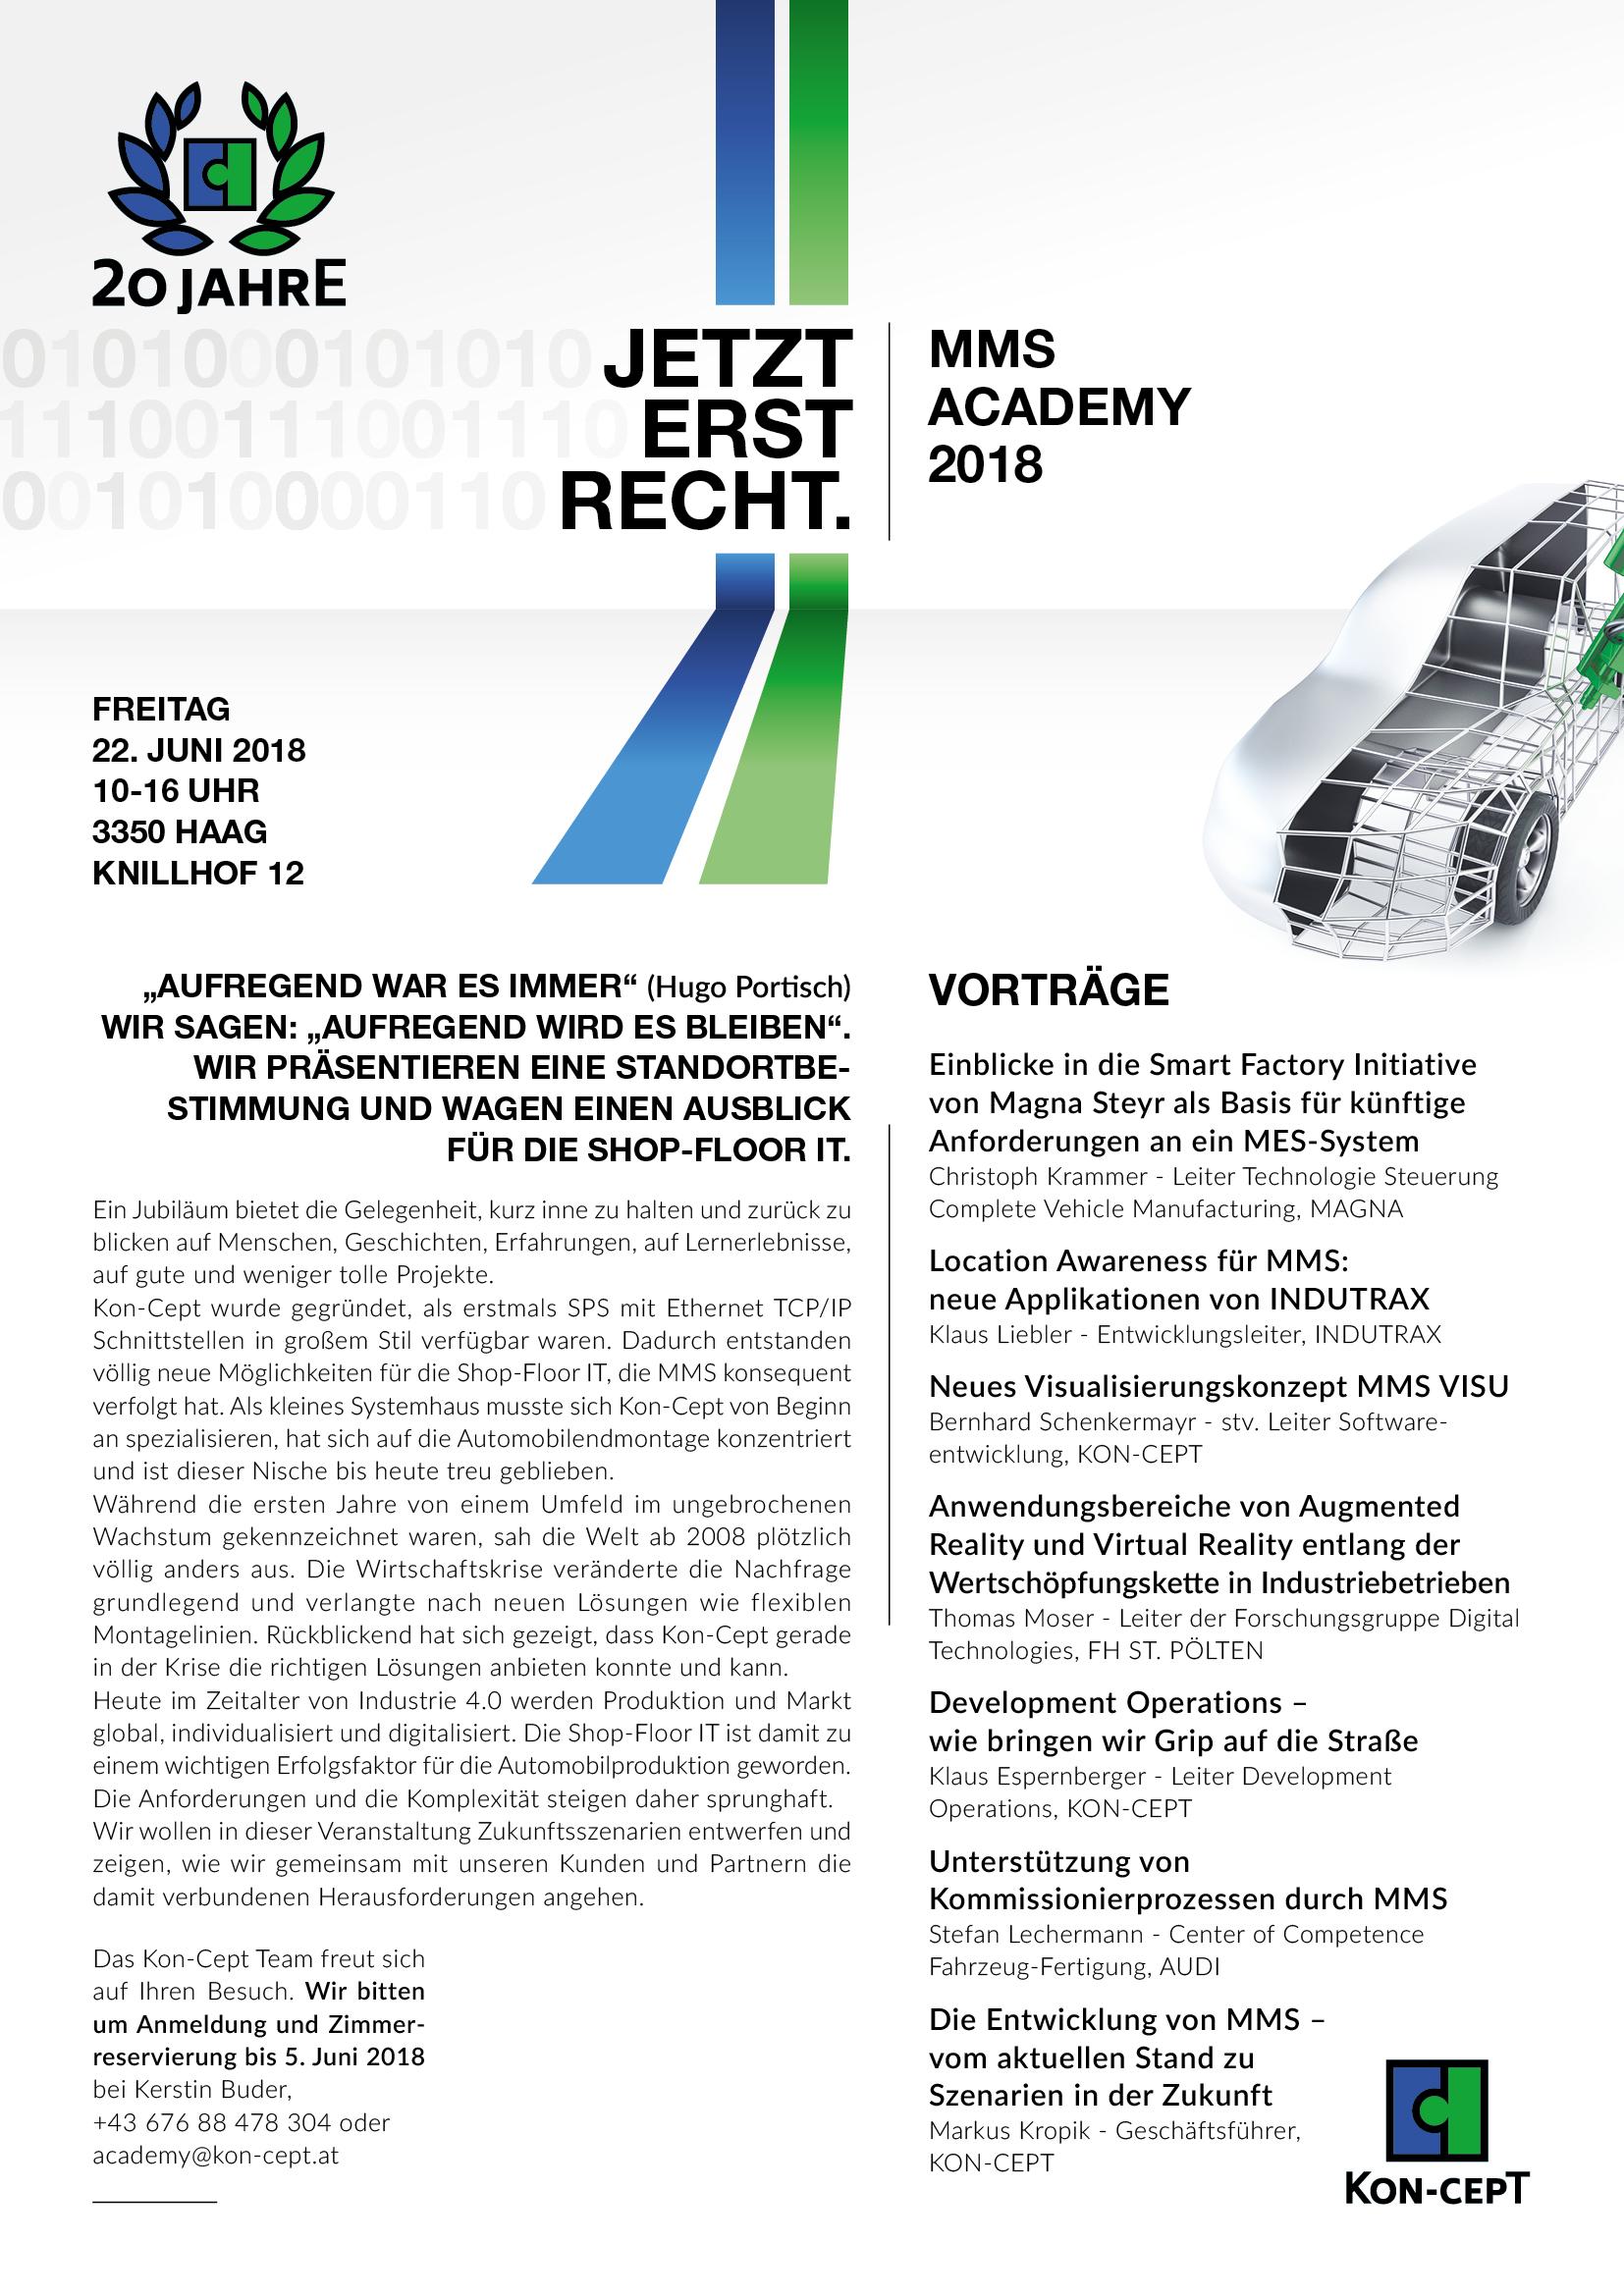 MMS Academy 2018 Programm